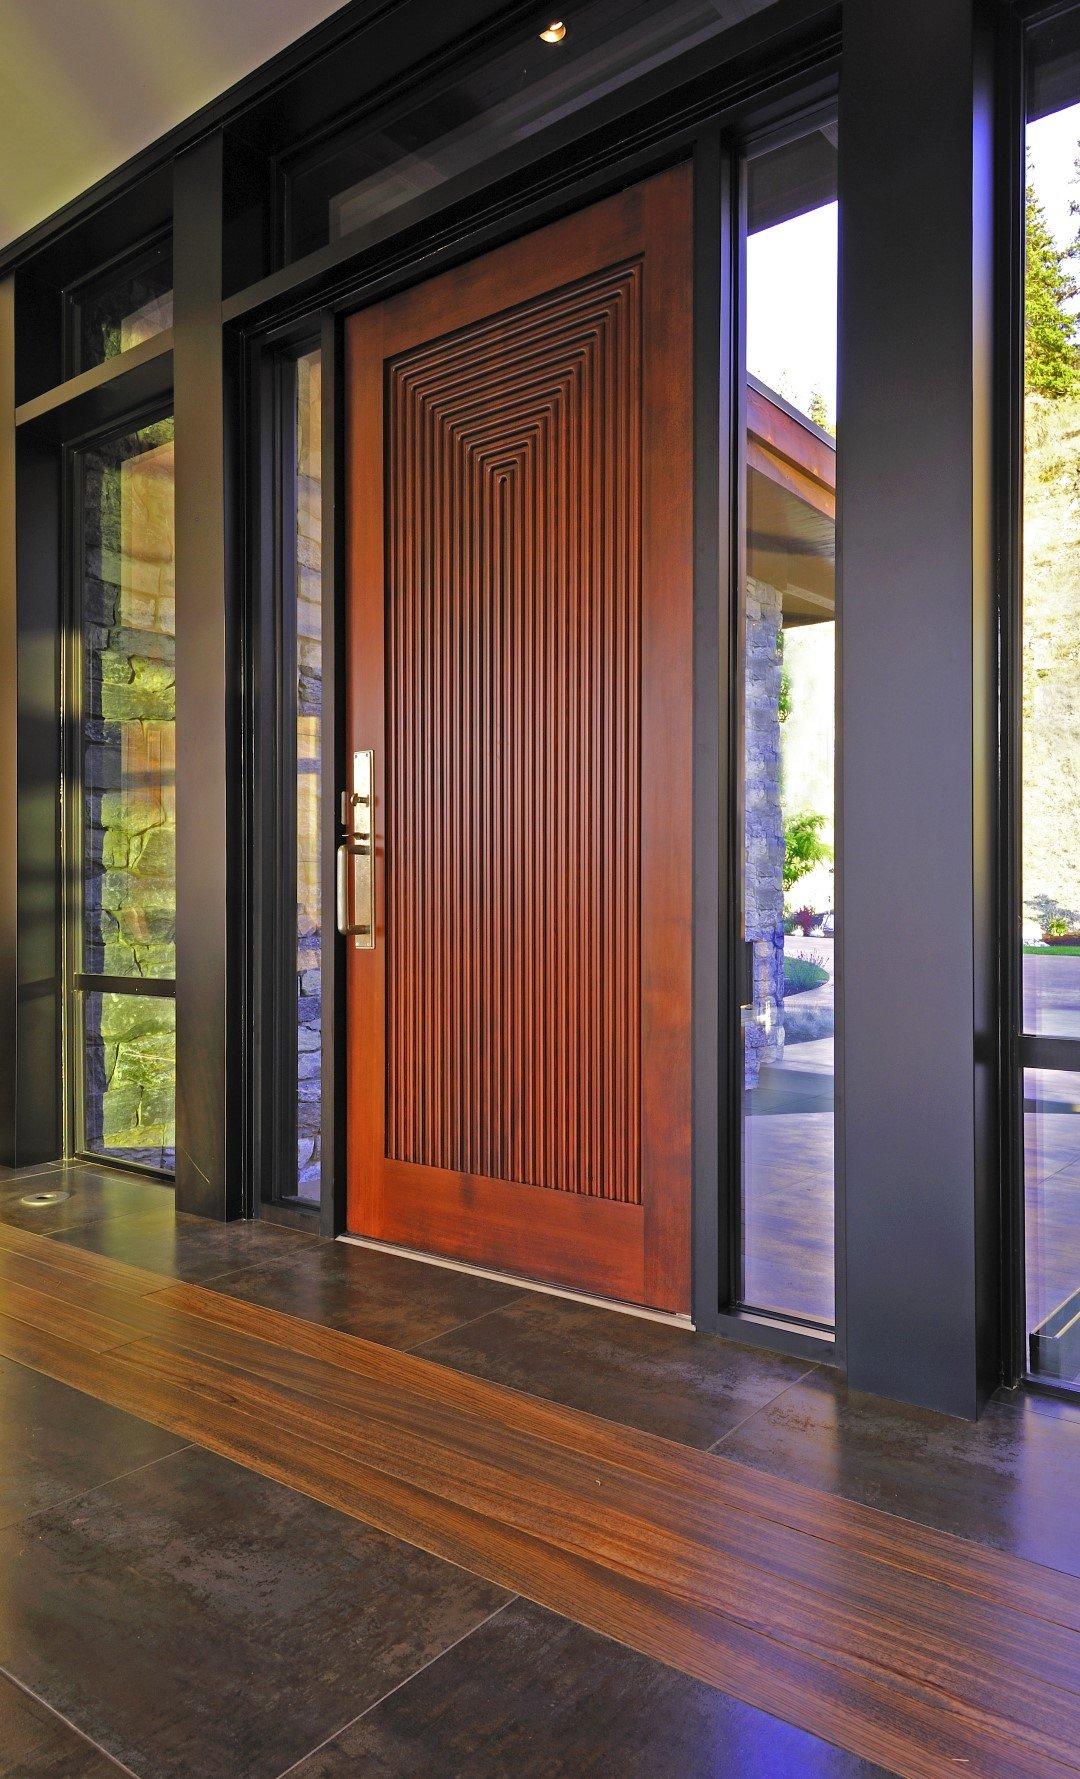 Entry way door